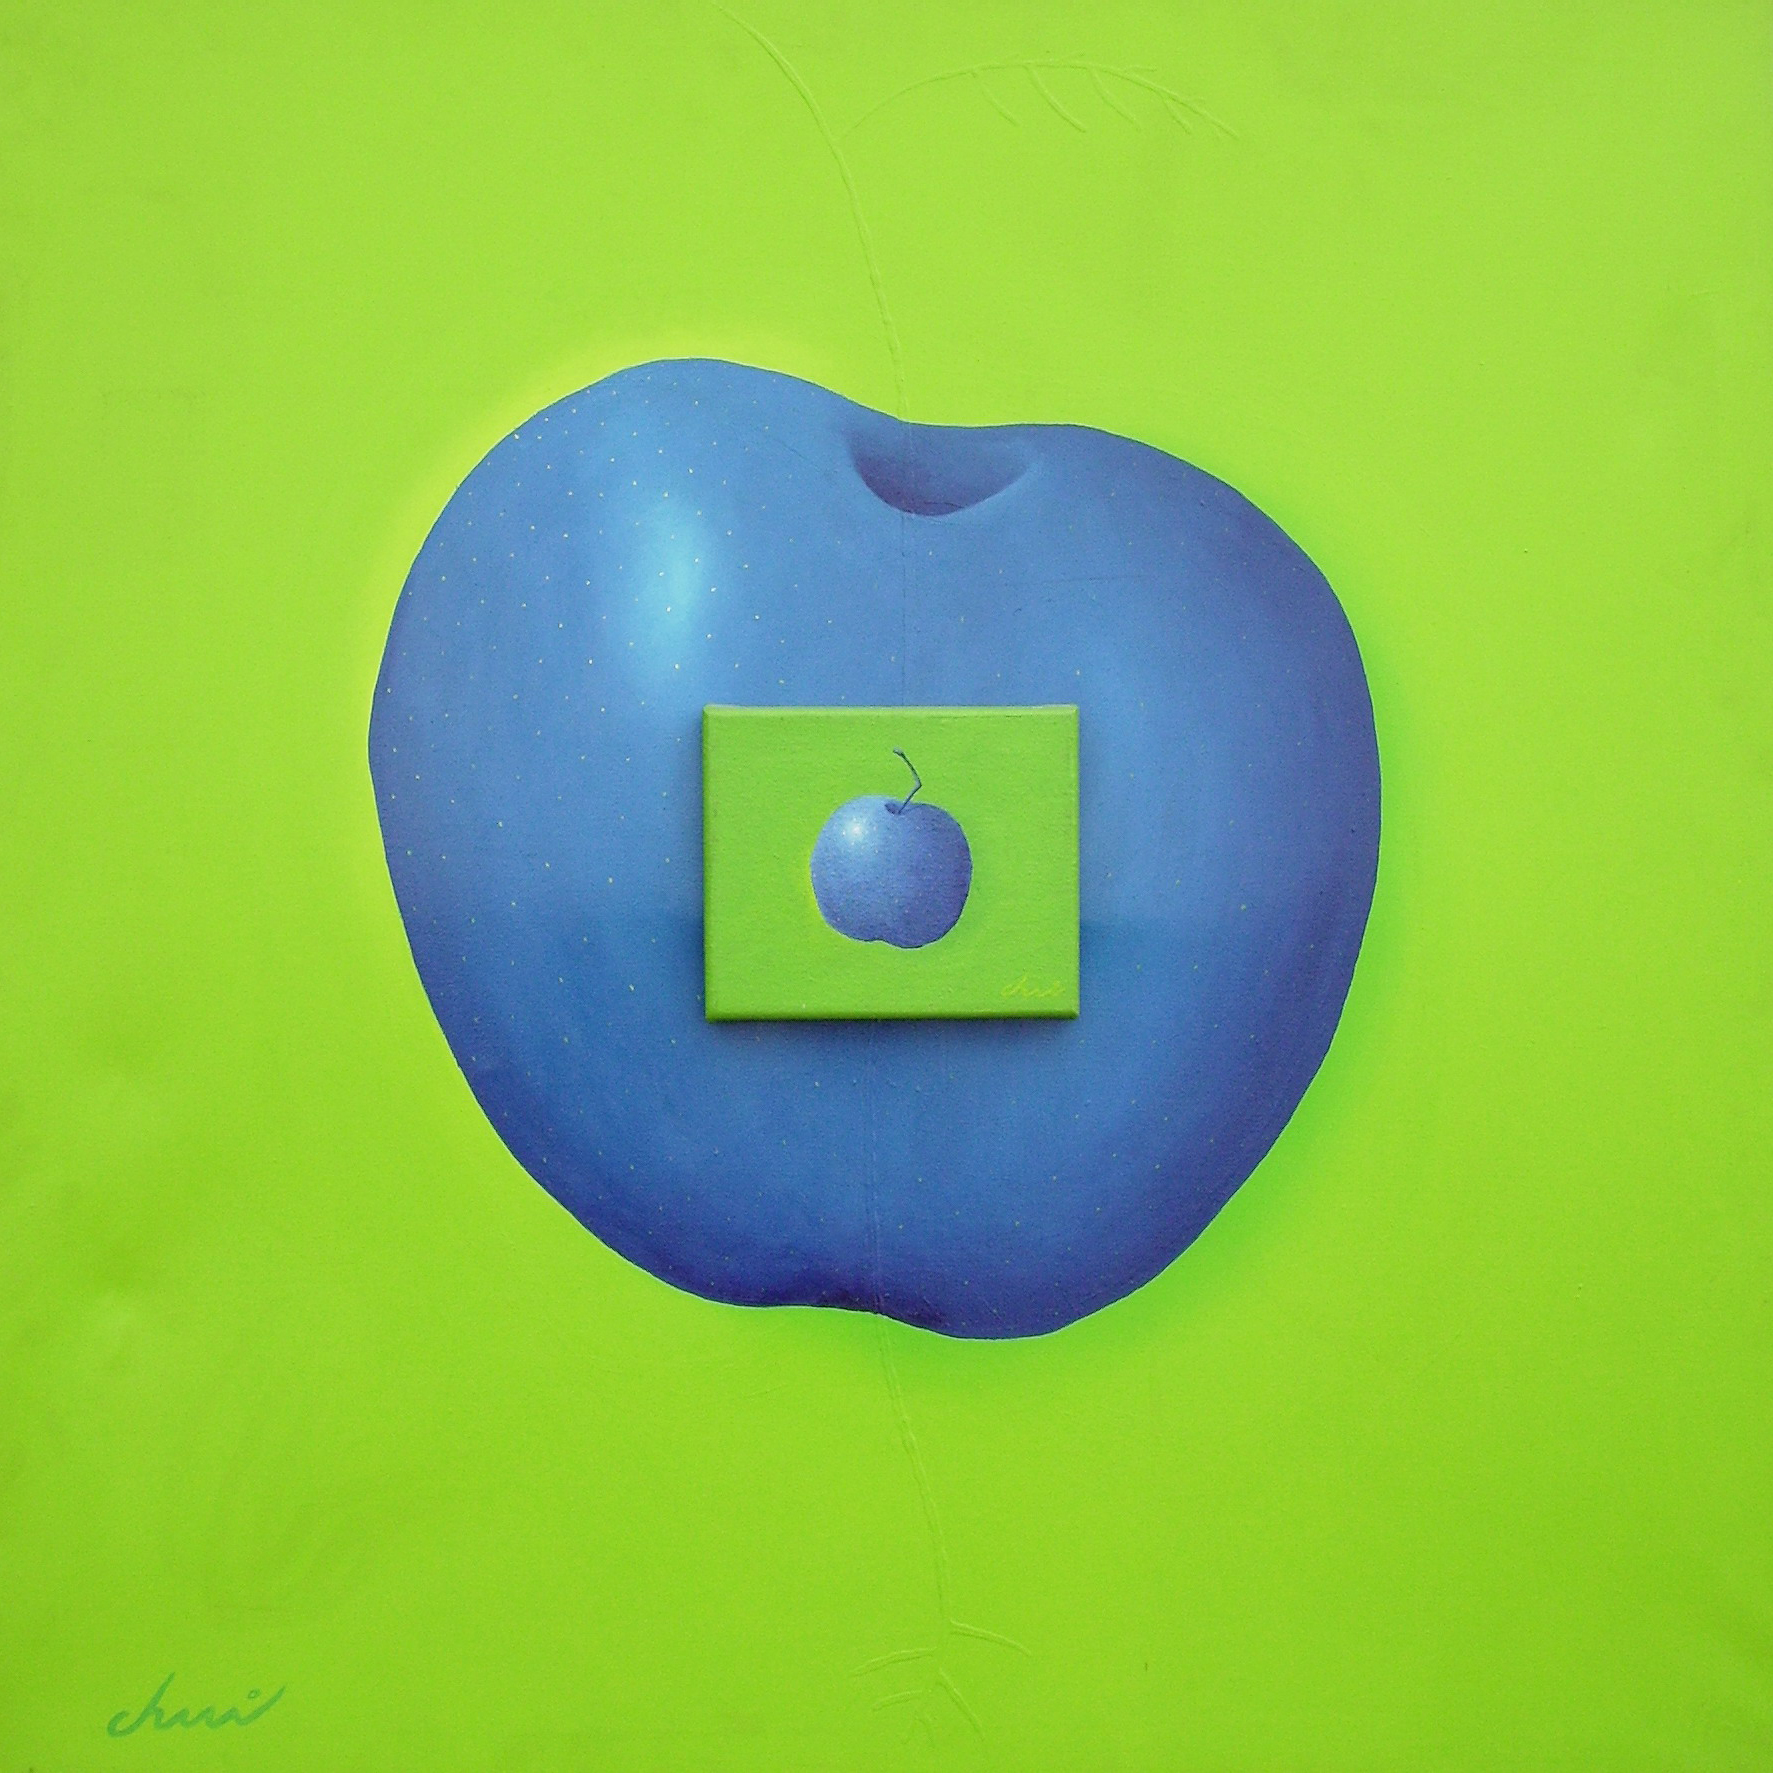 Manzana Ciánotica- Técnica mixta sobre tela -91 x 91 cm.- 2006.